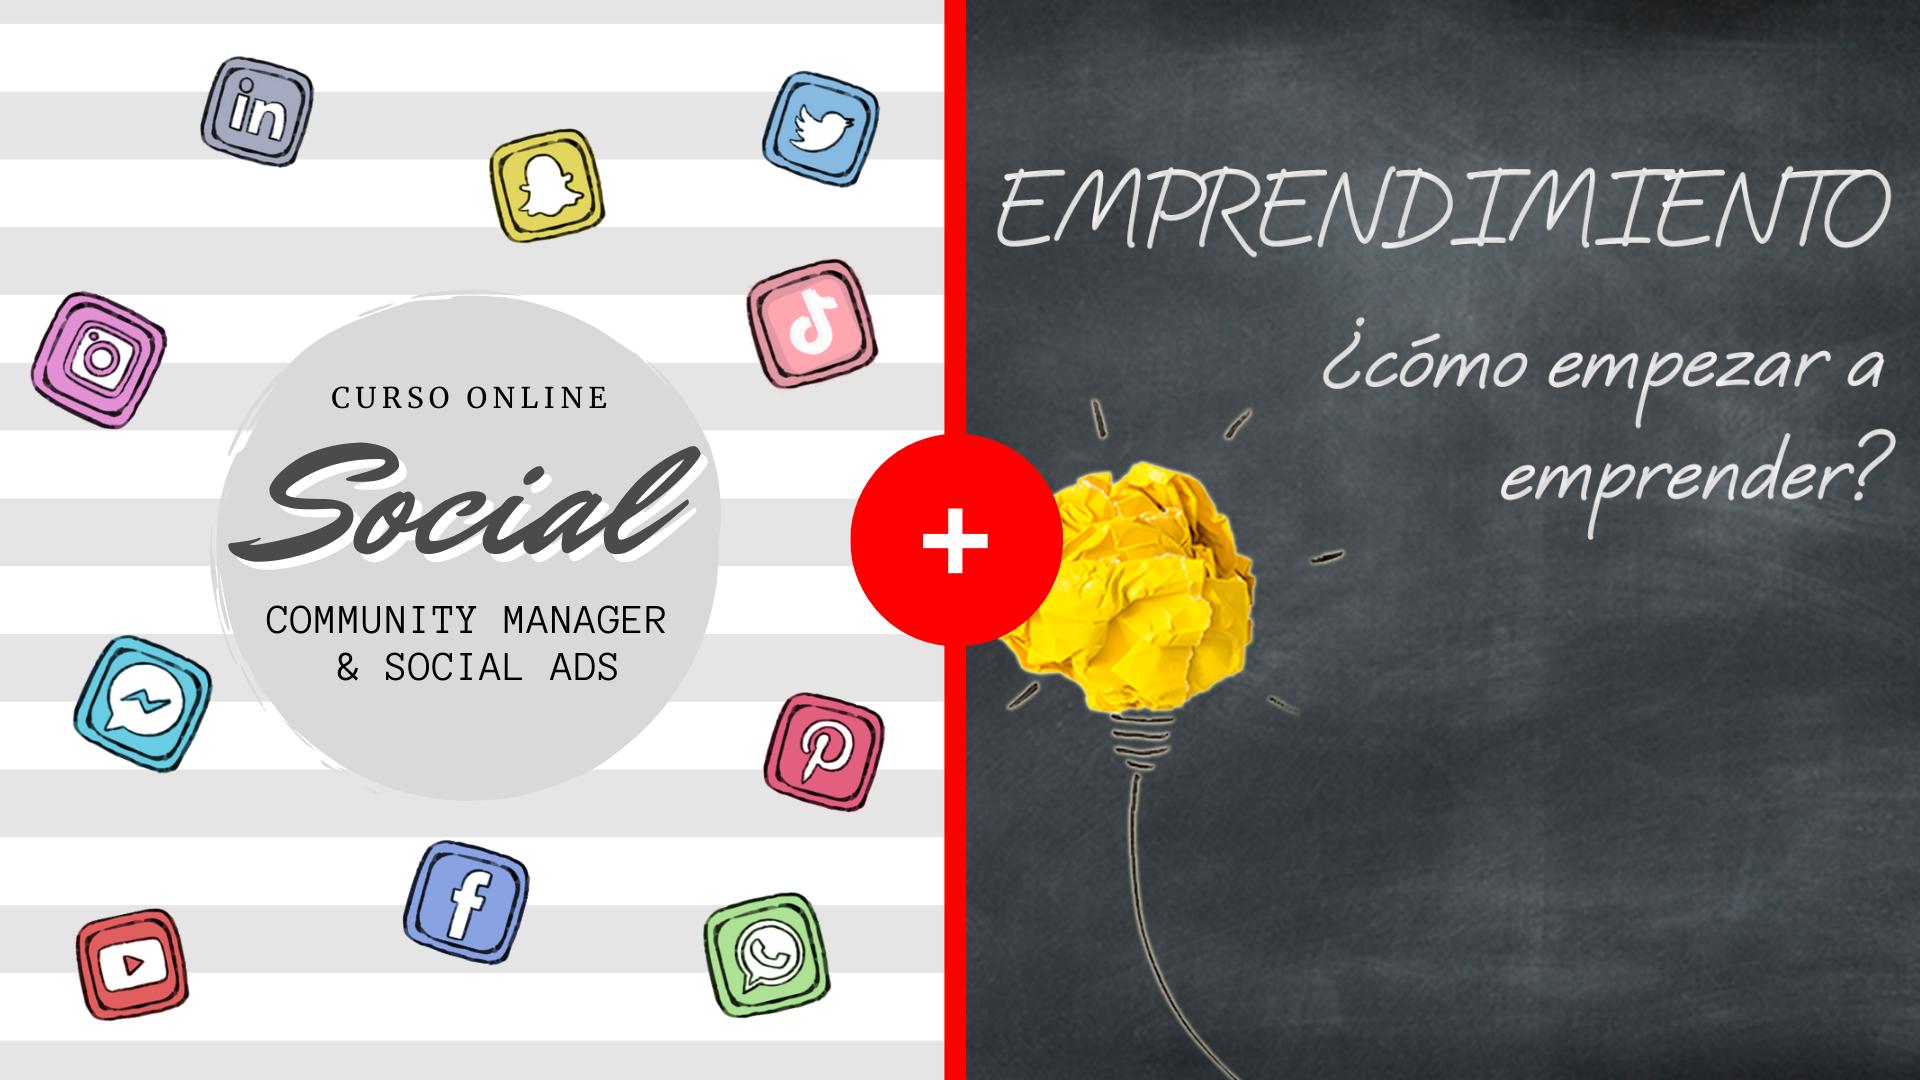 Curso de Emprendimiento + Social Full